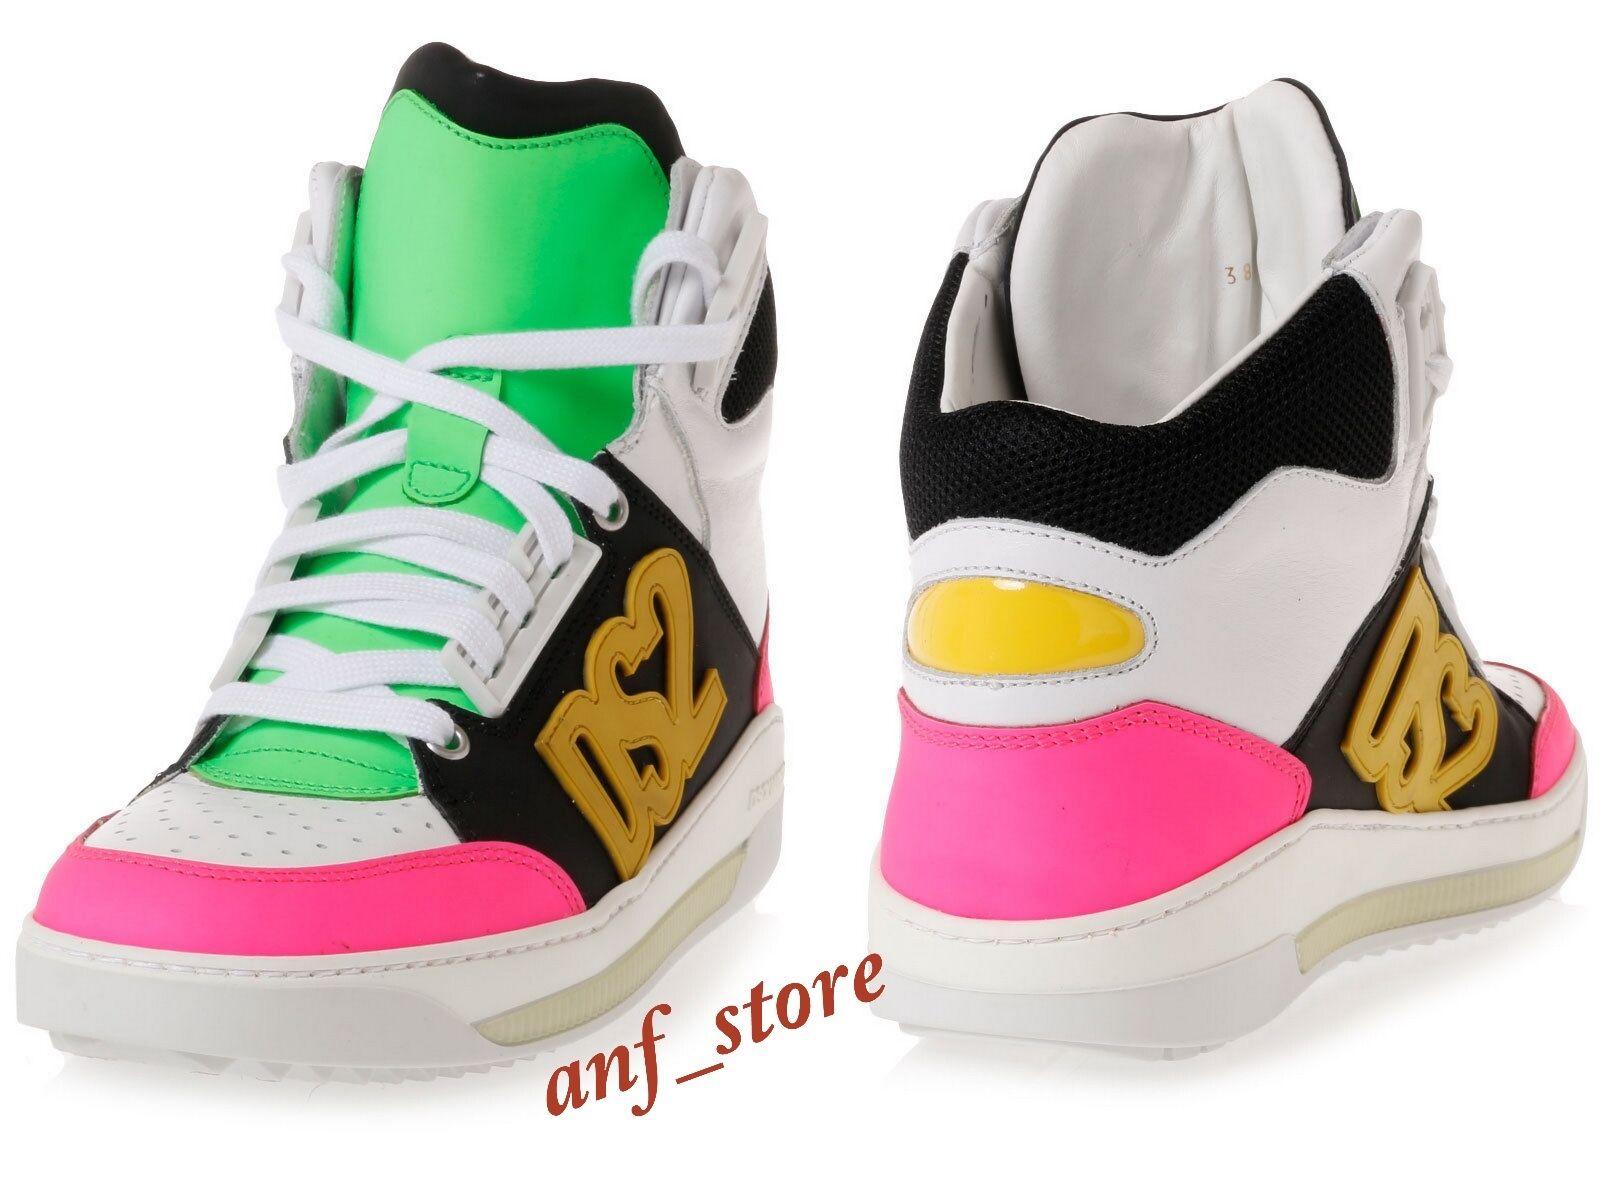 nouveau in Box DSQUArouge 2 High Top Sport Homme En Cuir mode sheakers chaussures 44 11  795 il